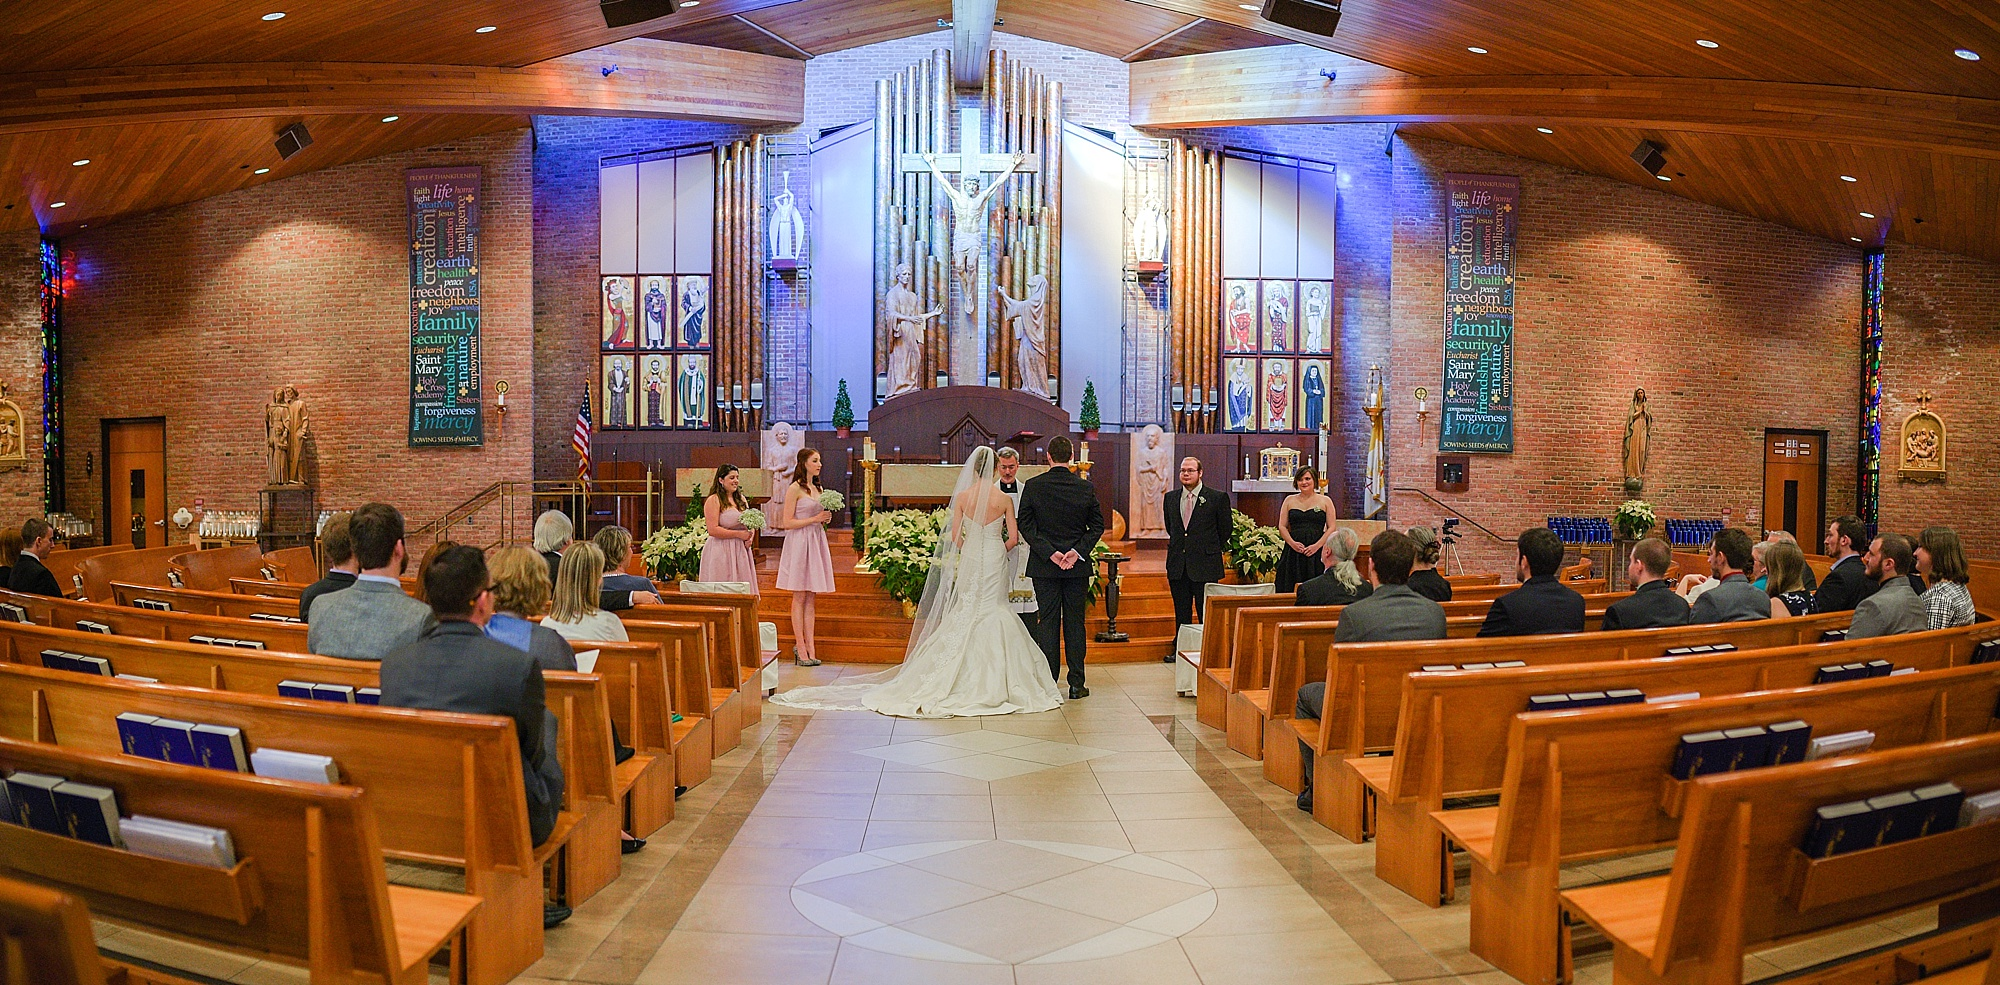 fredericksburg-wedding-church-mercantile_0016.jpg